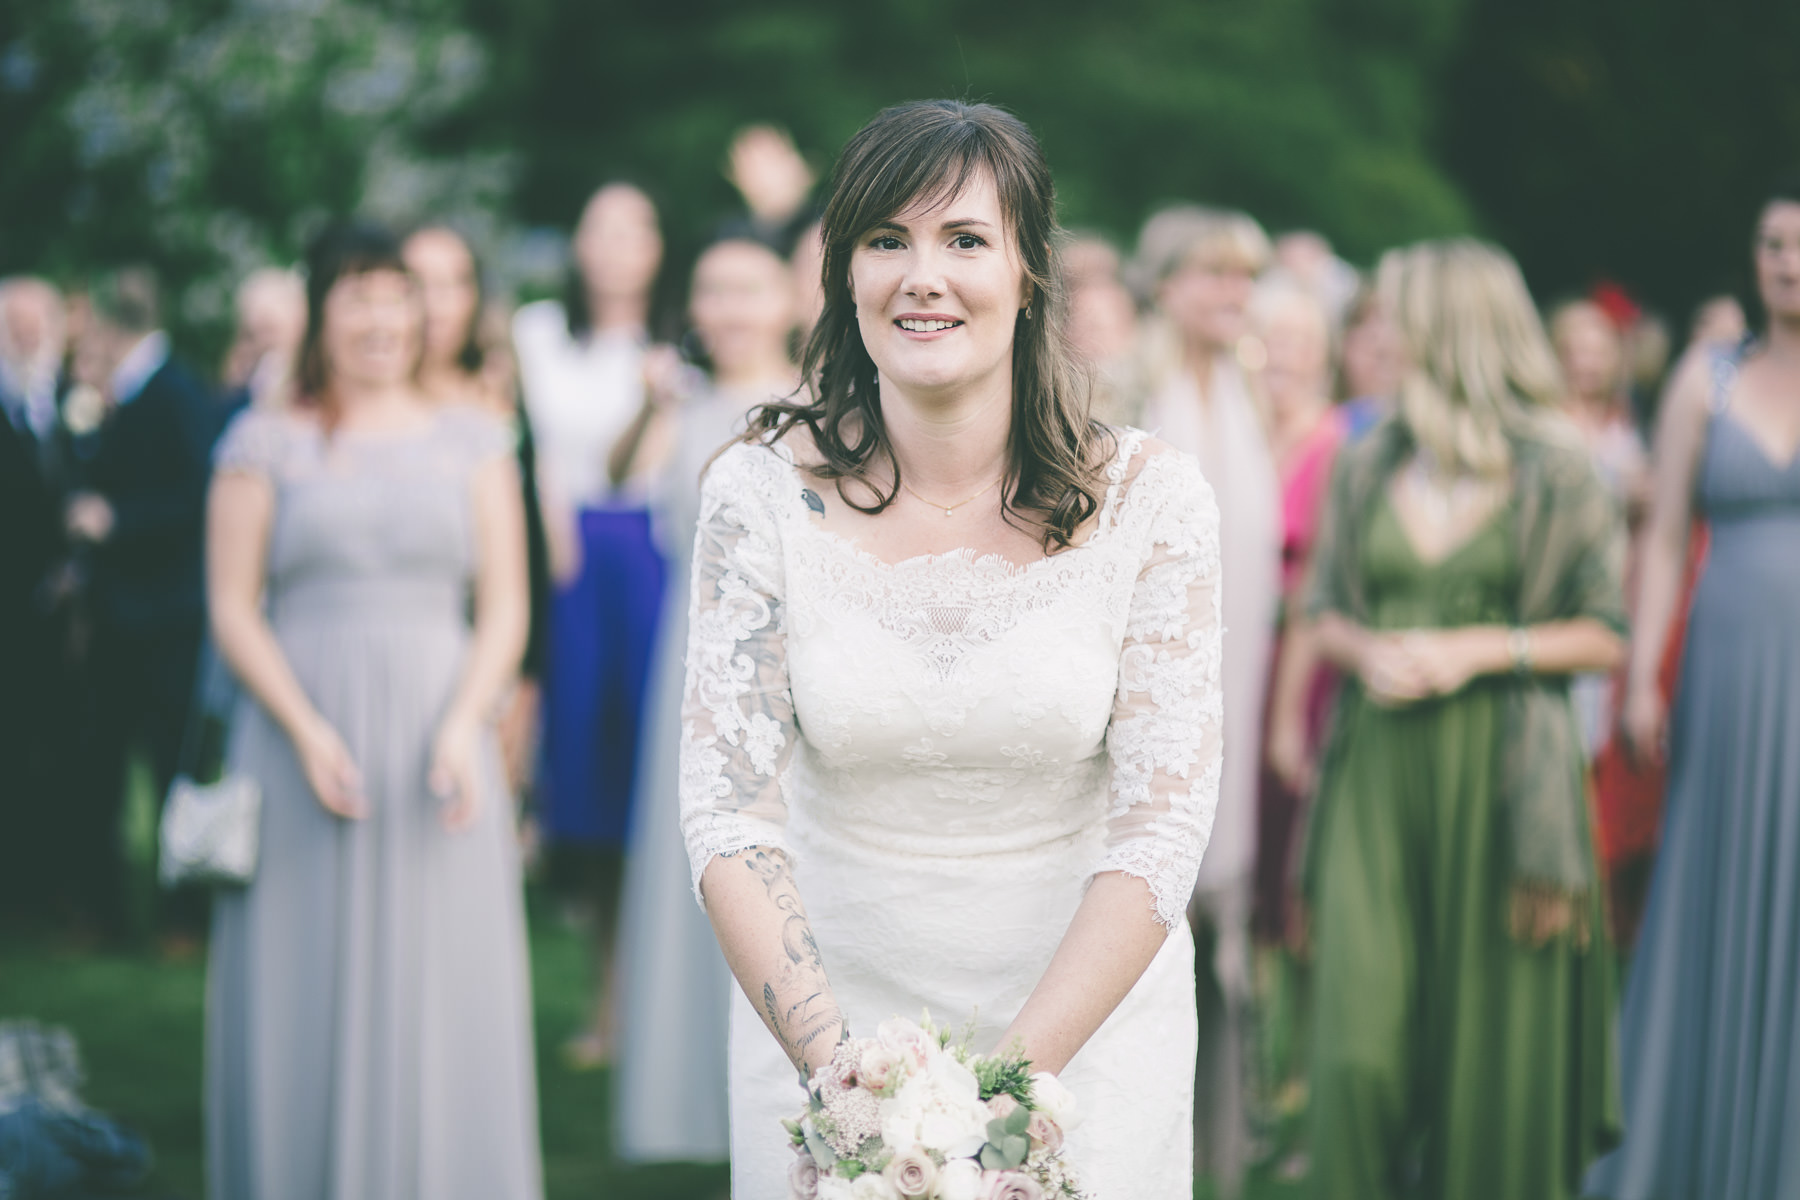 Pamber-Place-wedding-photography-basingstoke-hampshire-208